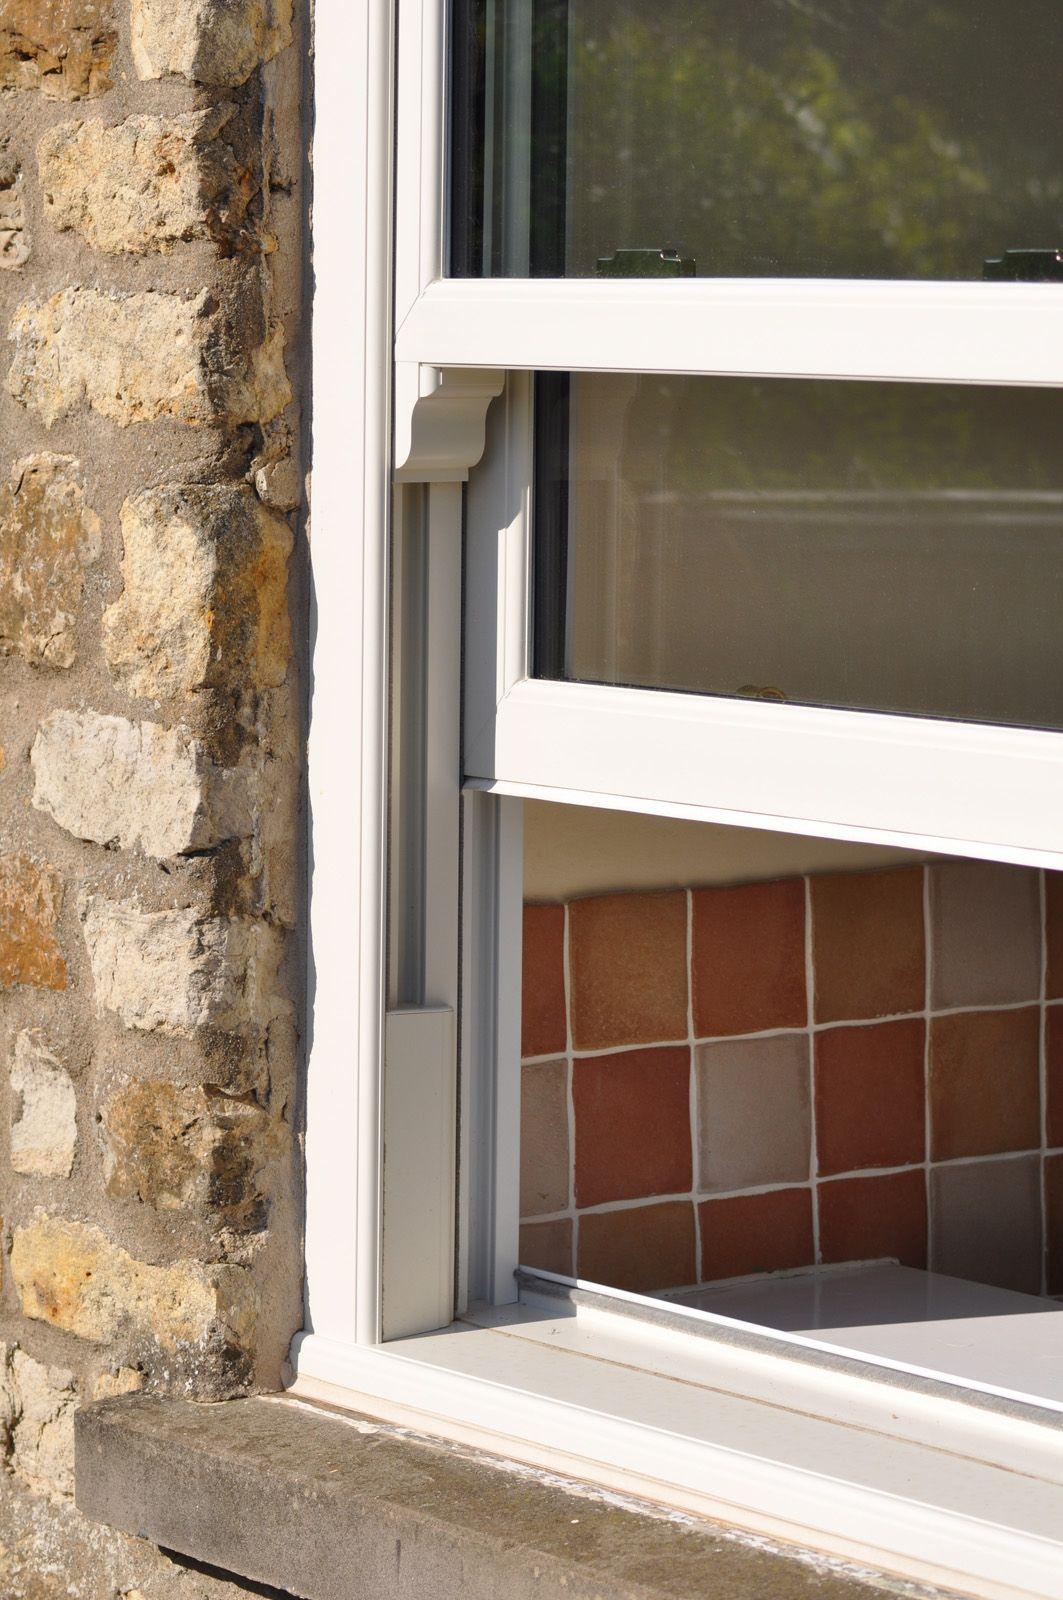 Vertical Sliding Windows Sliding windows, Windows, Vertical